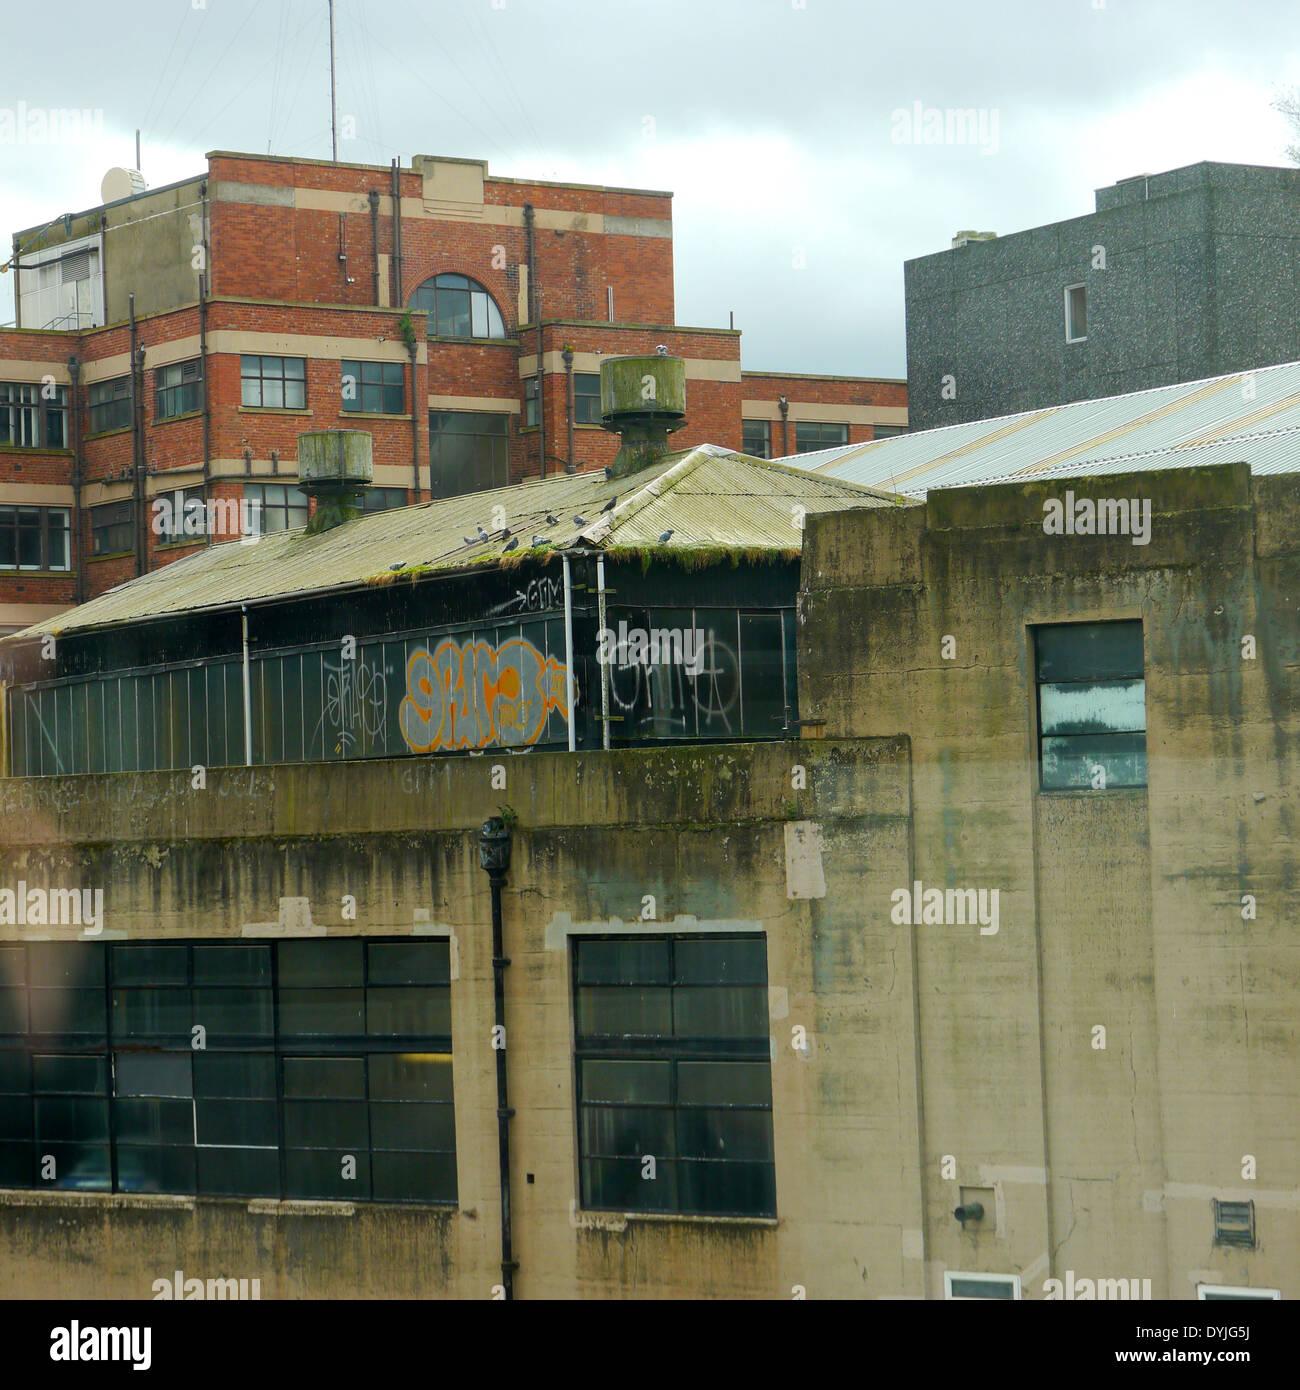 Abandoned Buildings Newcastle Uk